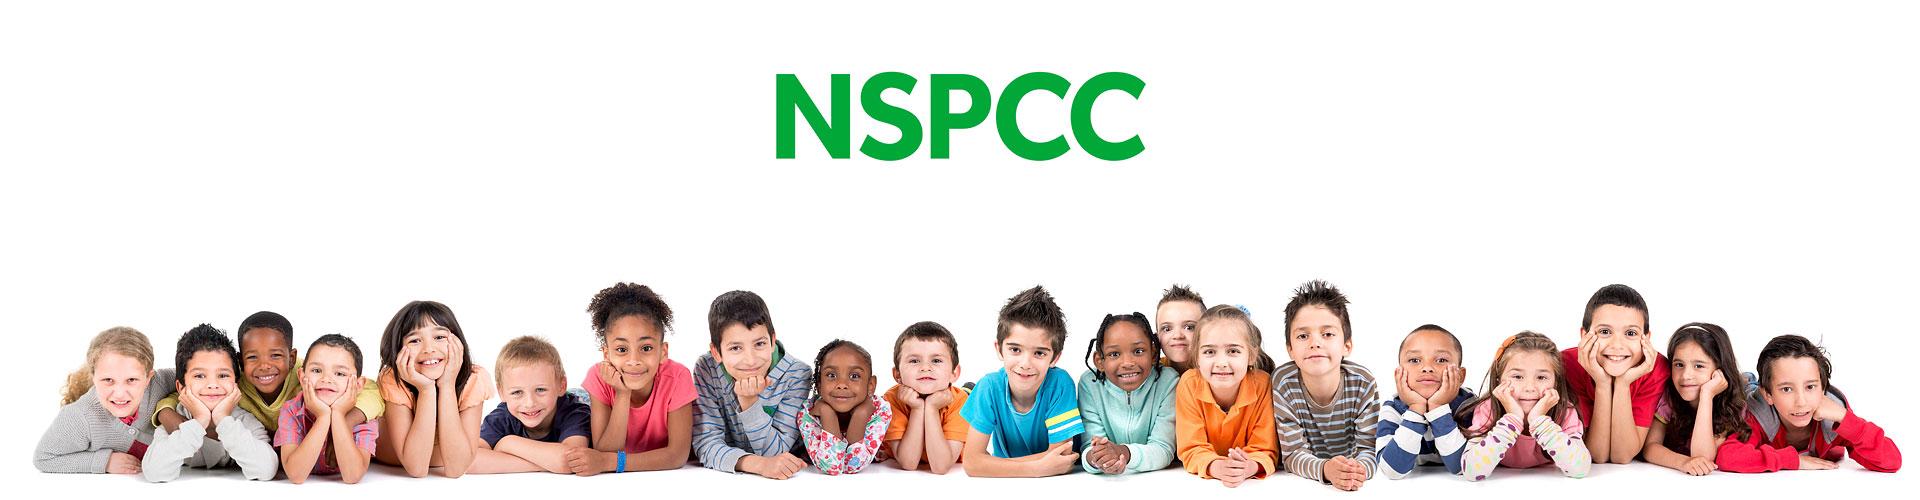 NSPCC fundraising